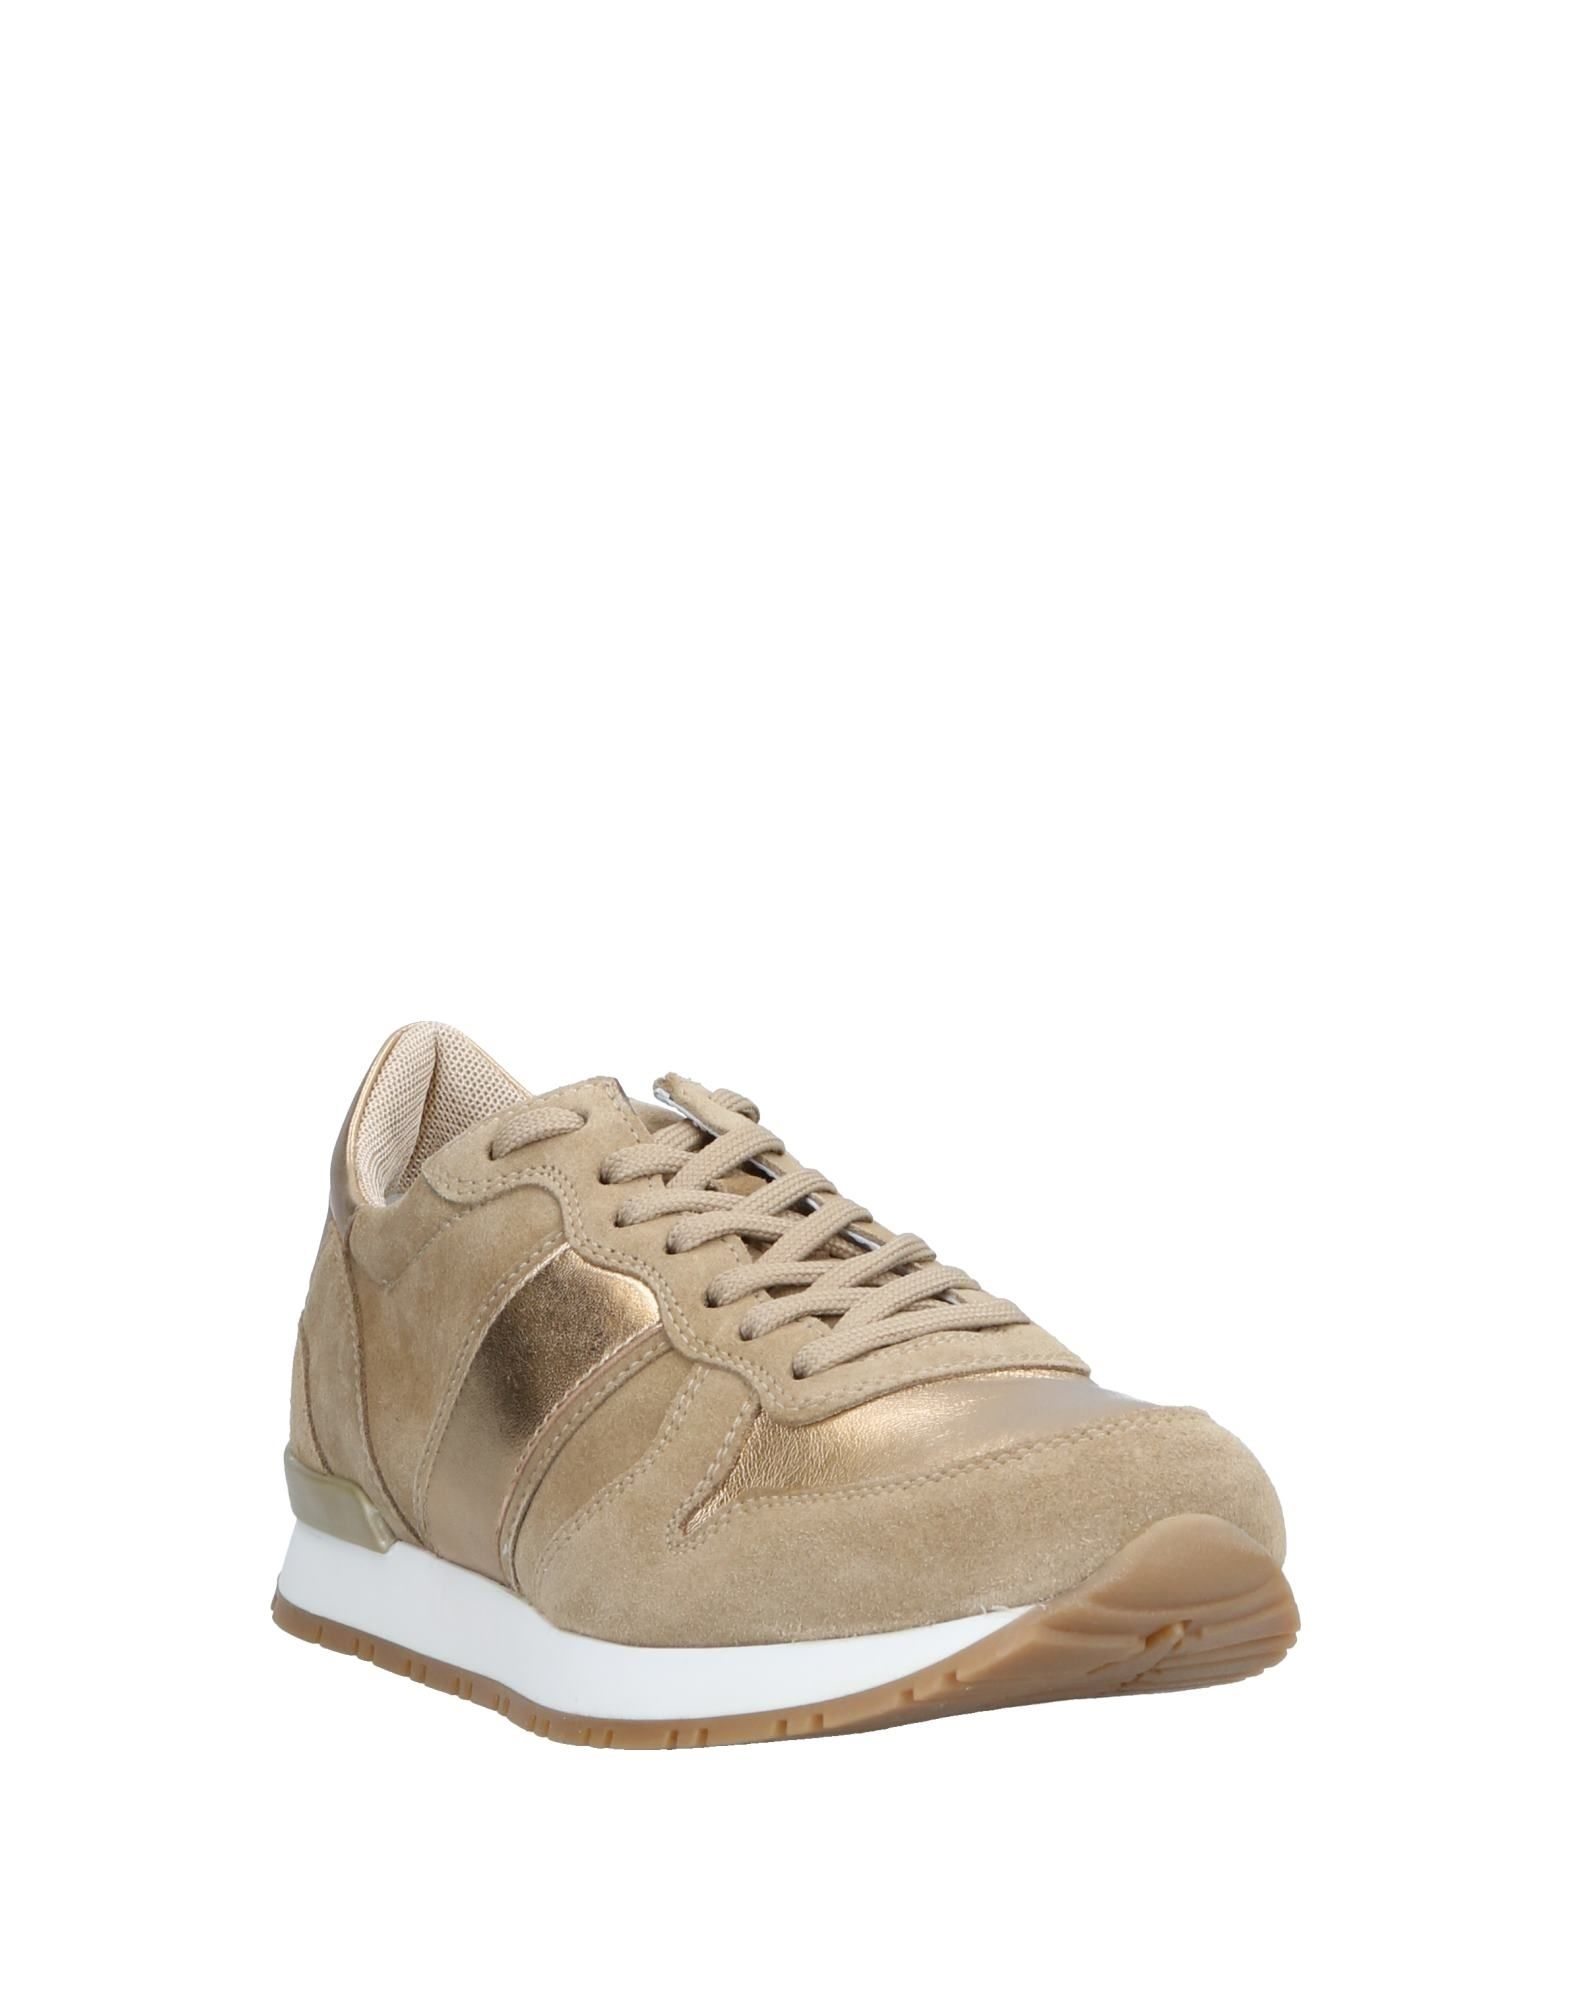 Stilvolle billige  Schuhe Cappelletti Sneakers Damen  billige 11517193JQ 74fe77